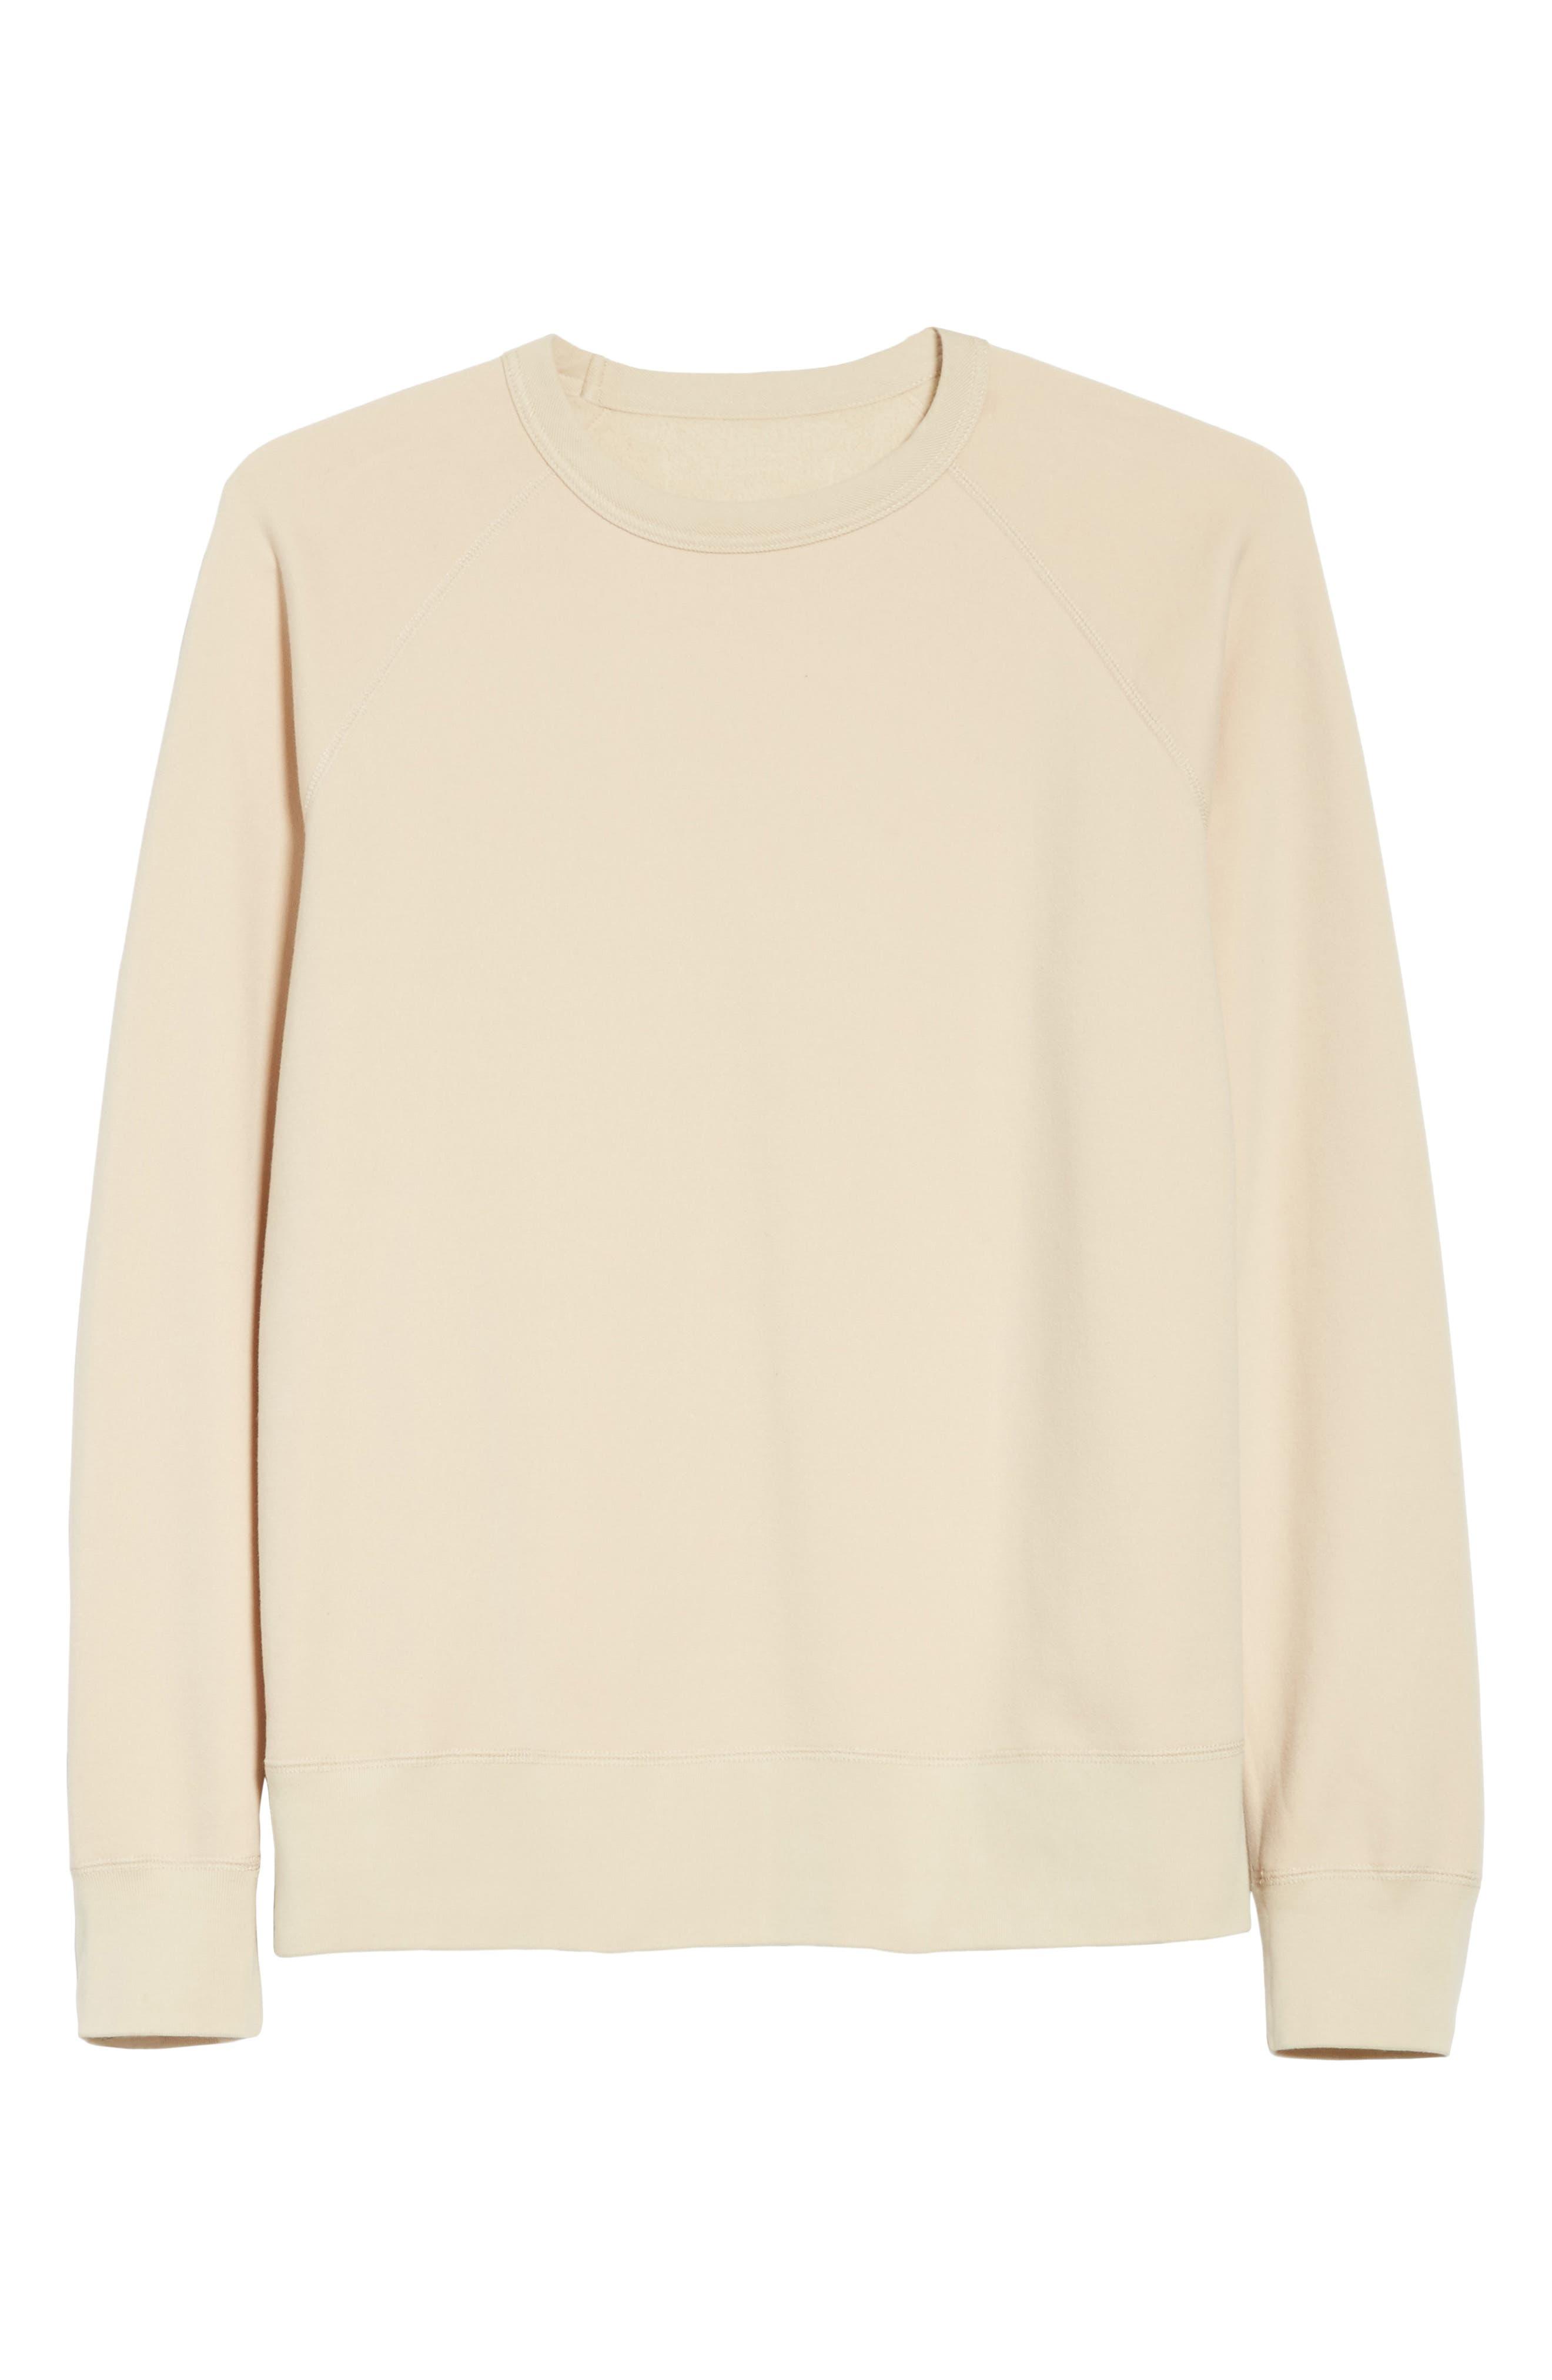 Reversible Raglan Crewneck Sweatshirt,                             Alternate thumbnail 6, color,                             Beige